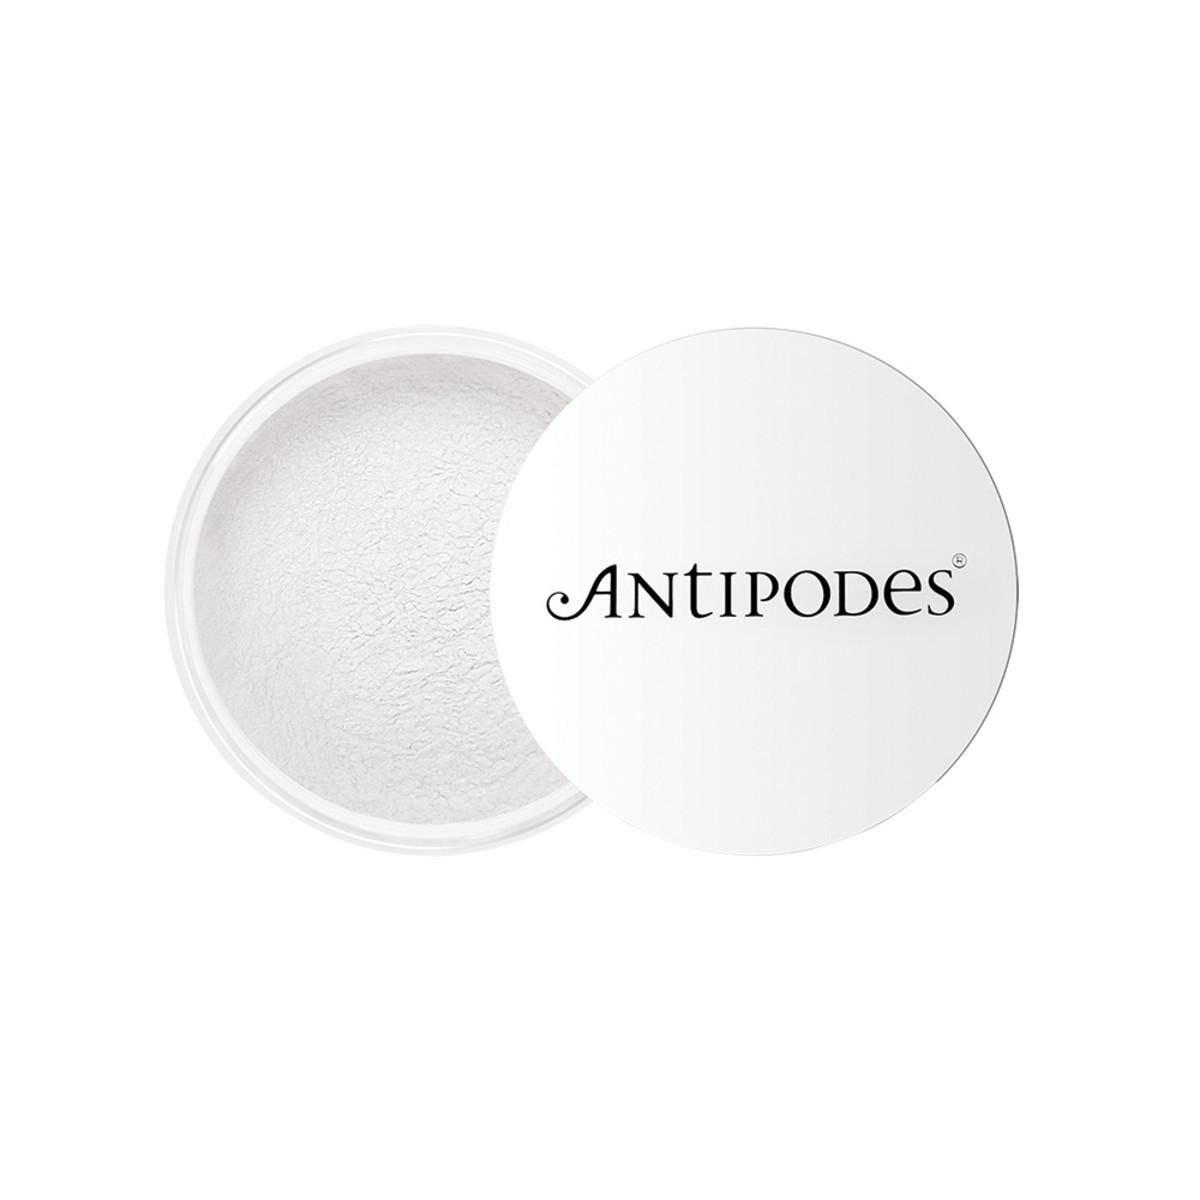 Antipodes Mineral Finishing Powder Translucent 11g_media-01